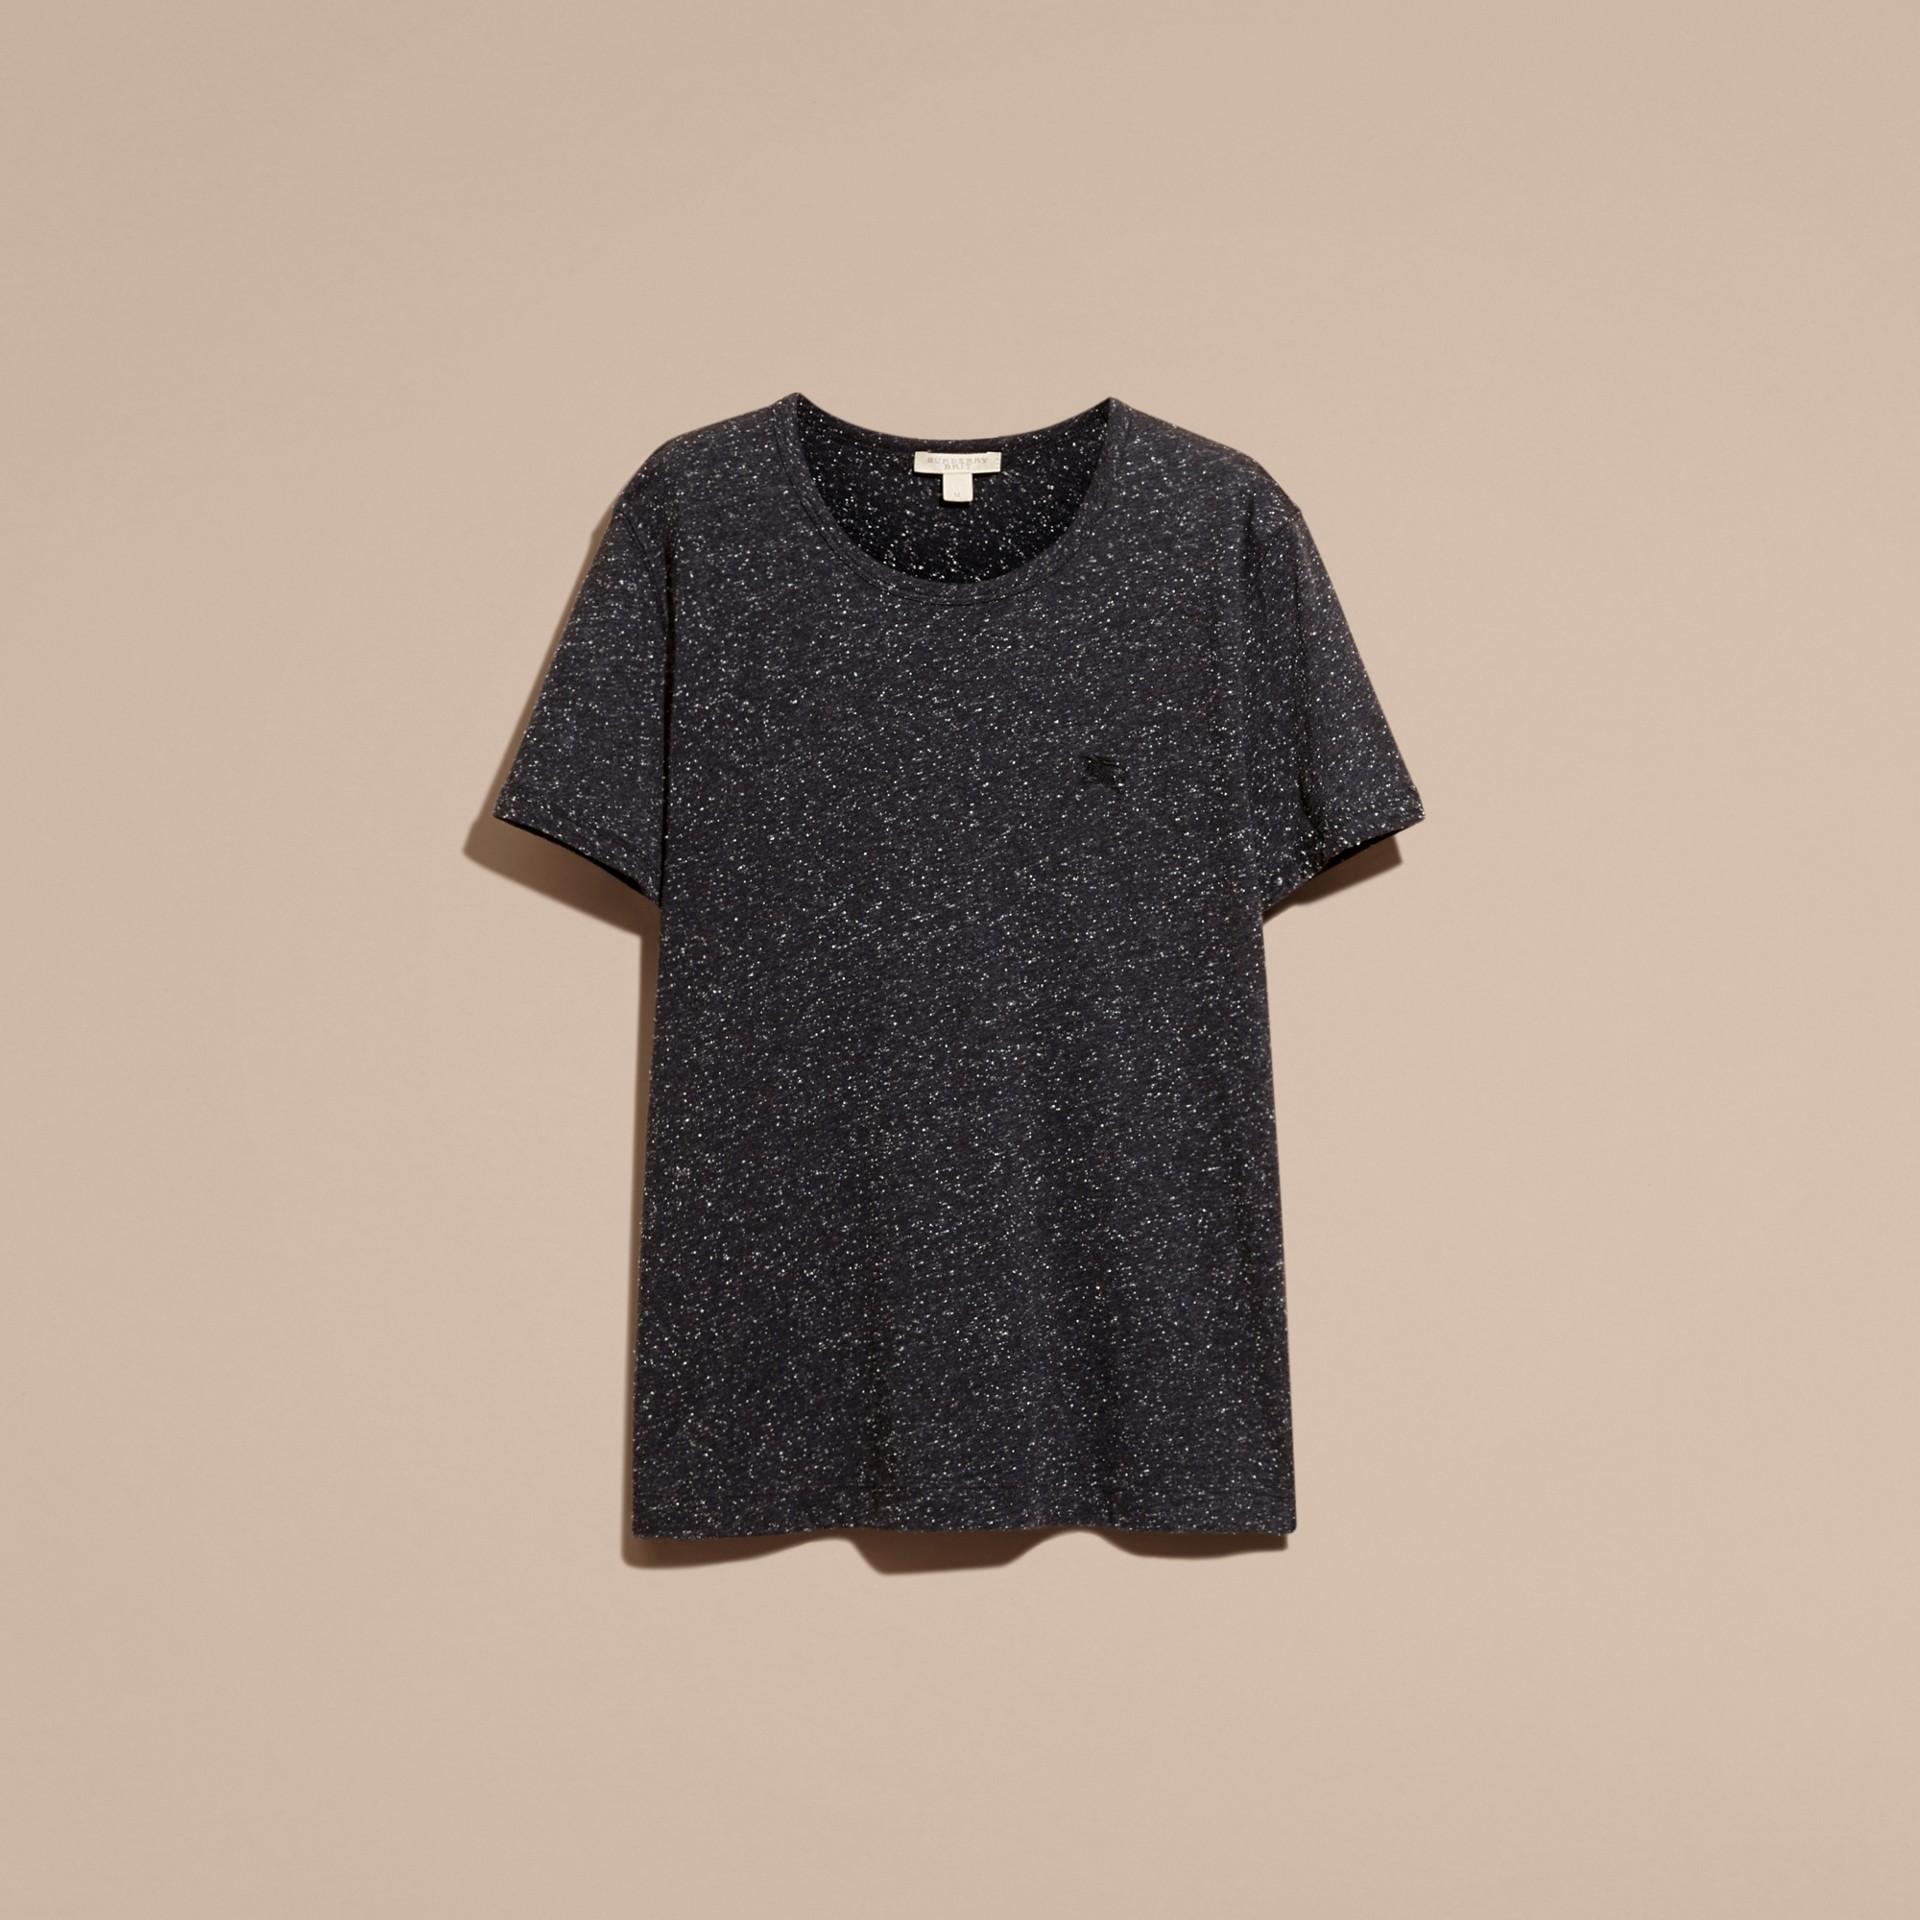 Black Crew Neck Flecked Cotton Jersey T-Shirt Black - gallery image 4